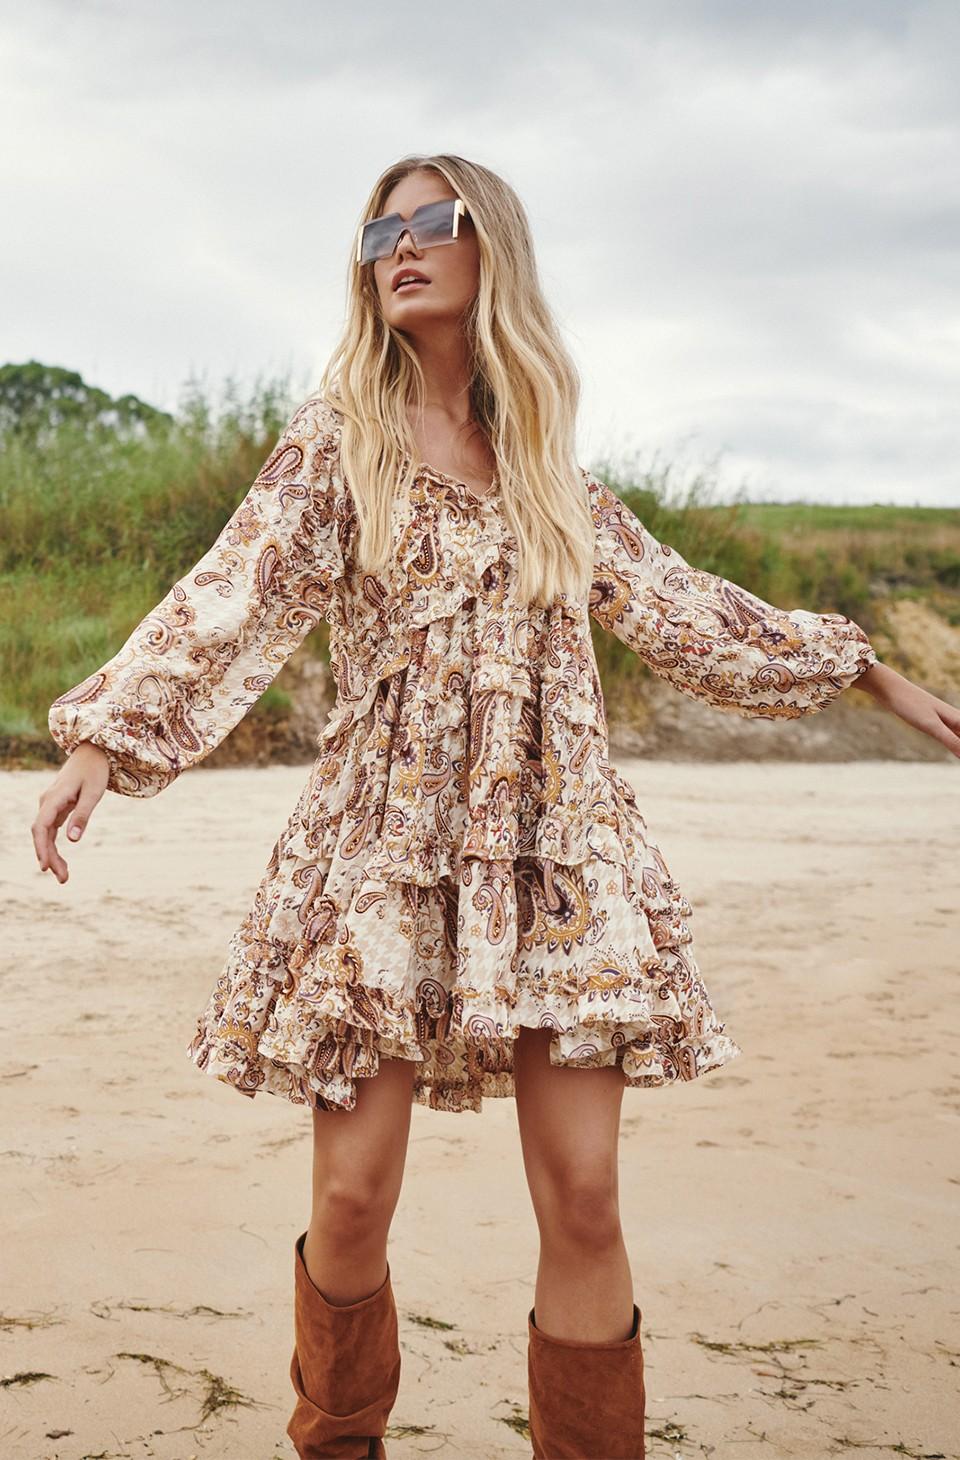 blanchett-dress-by-fetiche-suances (1) -SevenTimes